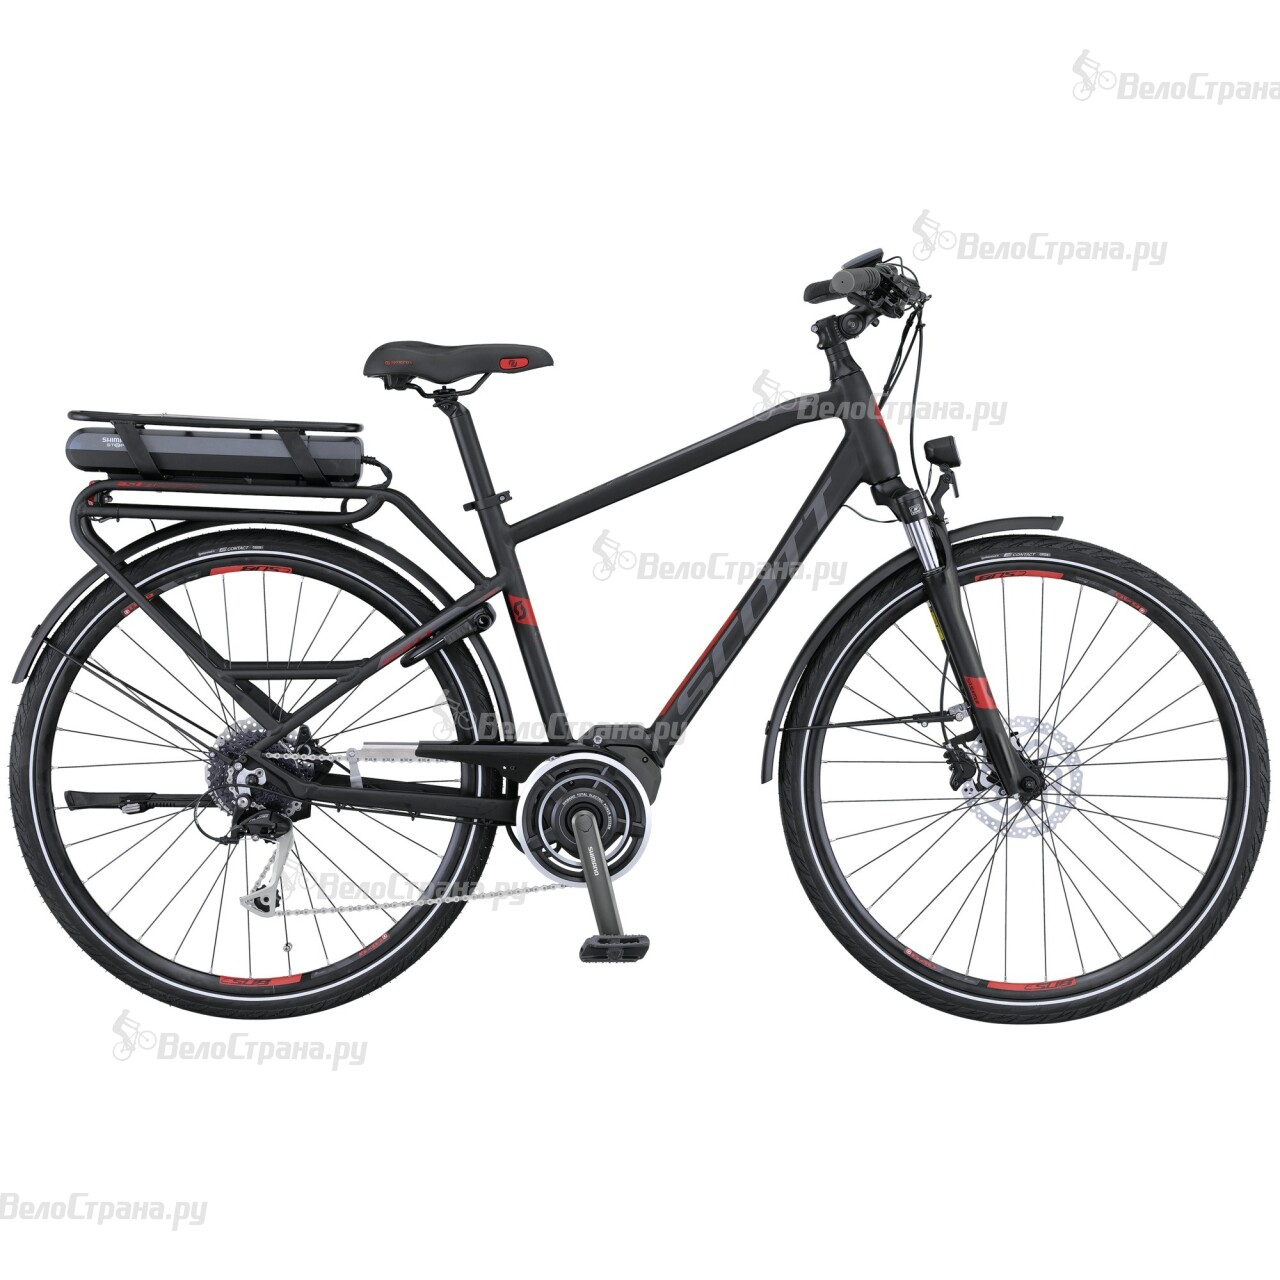 Велосипед Scott E-Sub Comfort Men (2016) велосипед scott aspect 700 27 5 2016